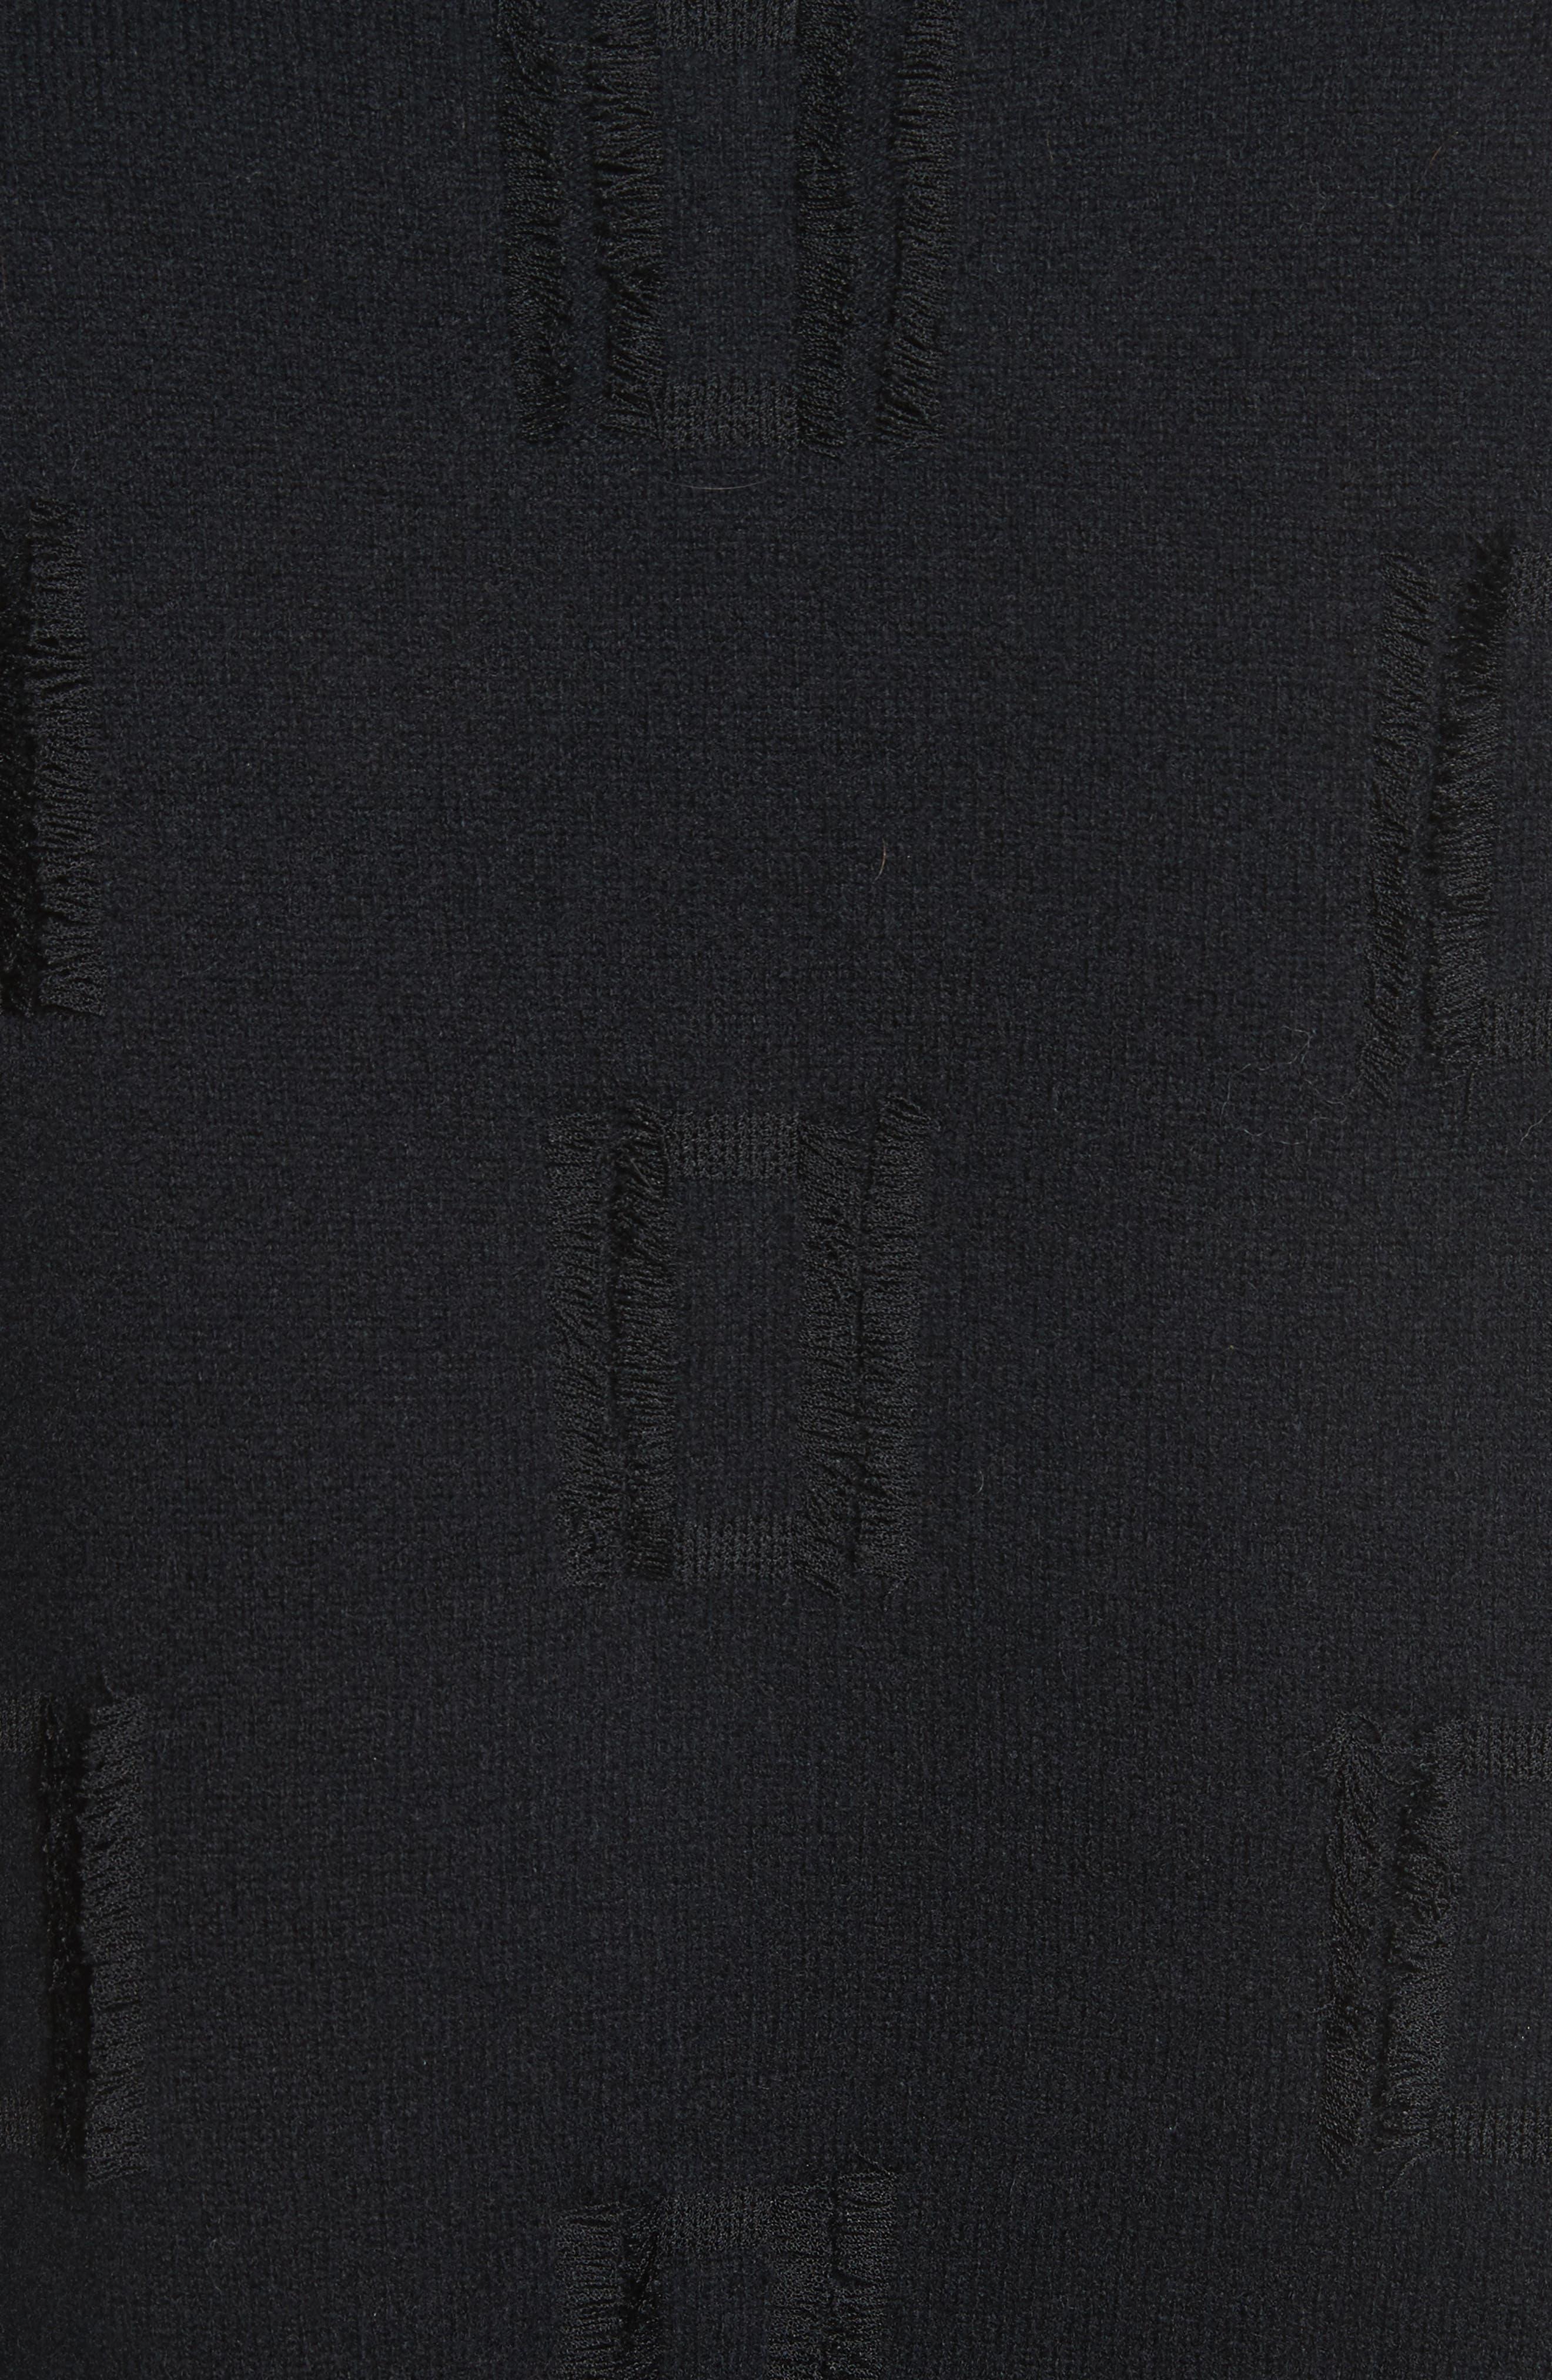 Fringe Trim Turtleneck Sweater,                             Alternate thumbnail 5, color,                             Black